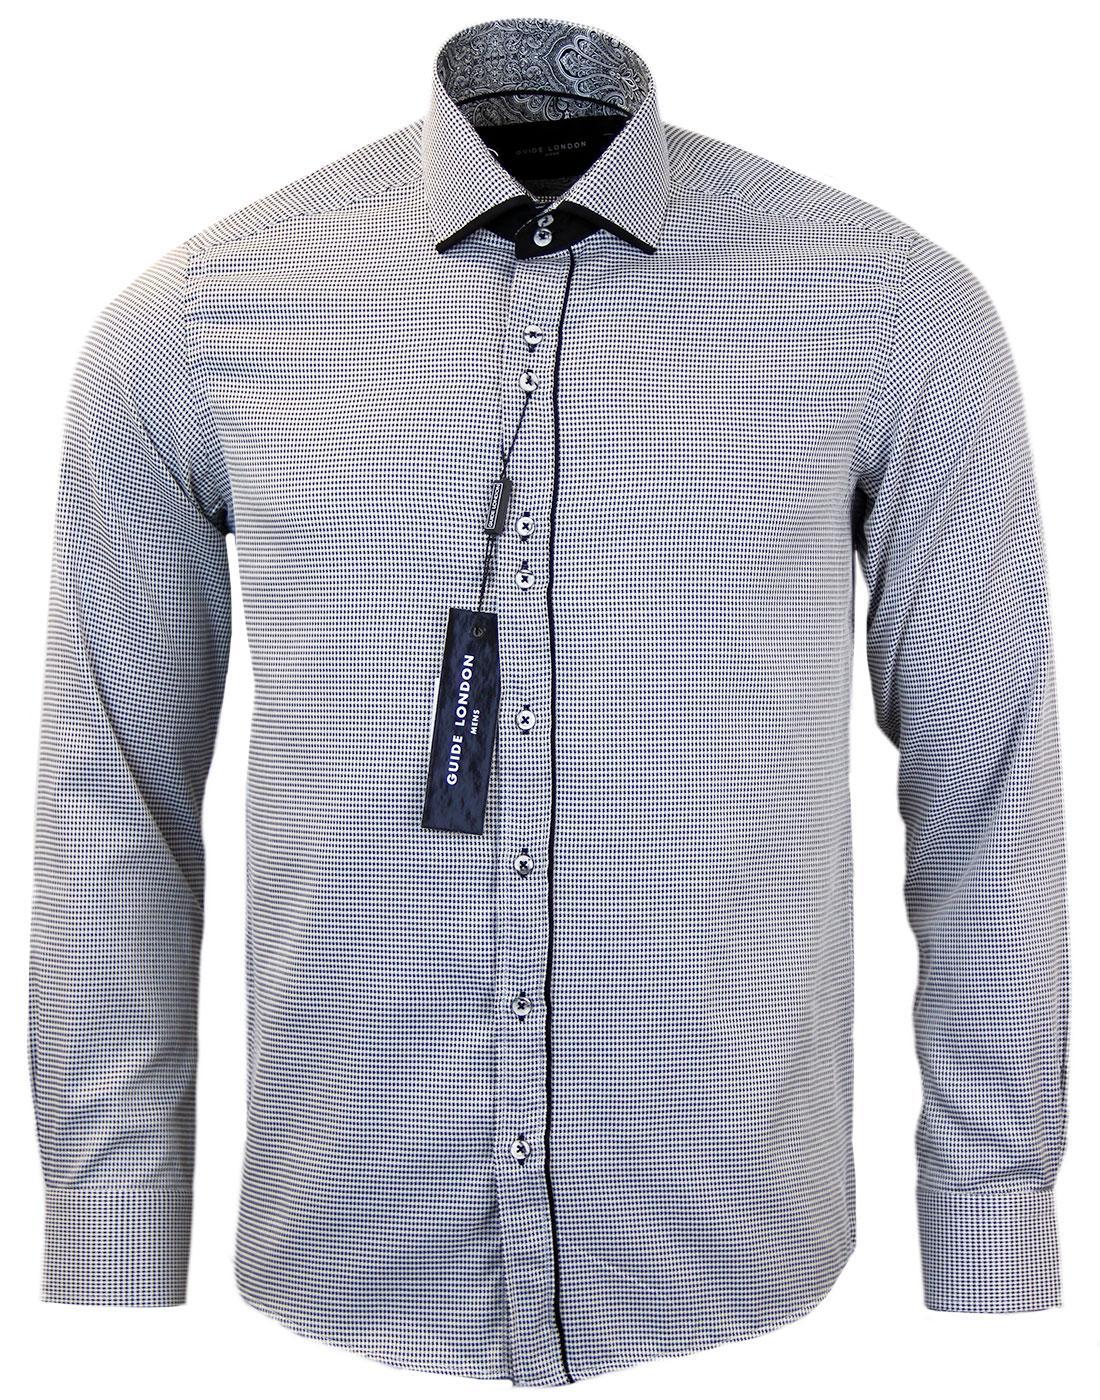 GUIDE LONDON Retro Mod Dogtooth Big Collar Shirt